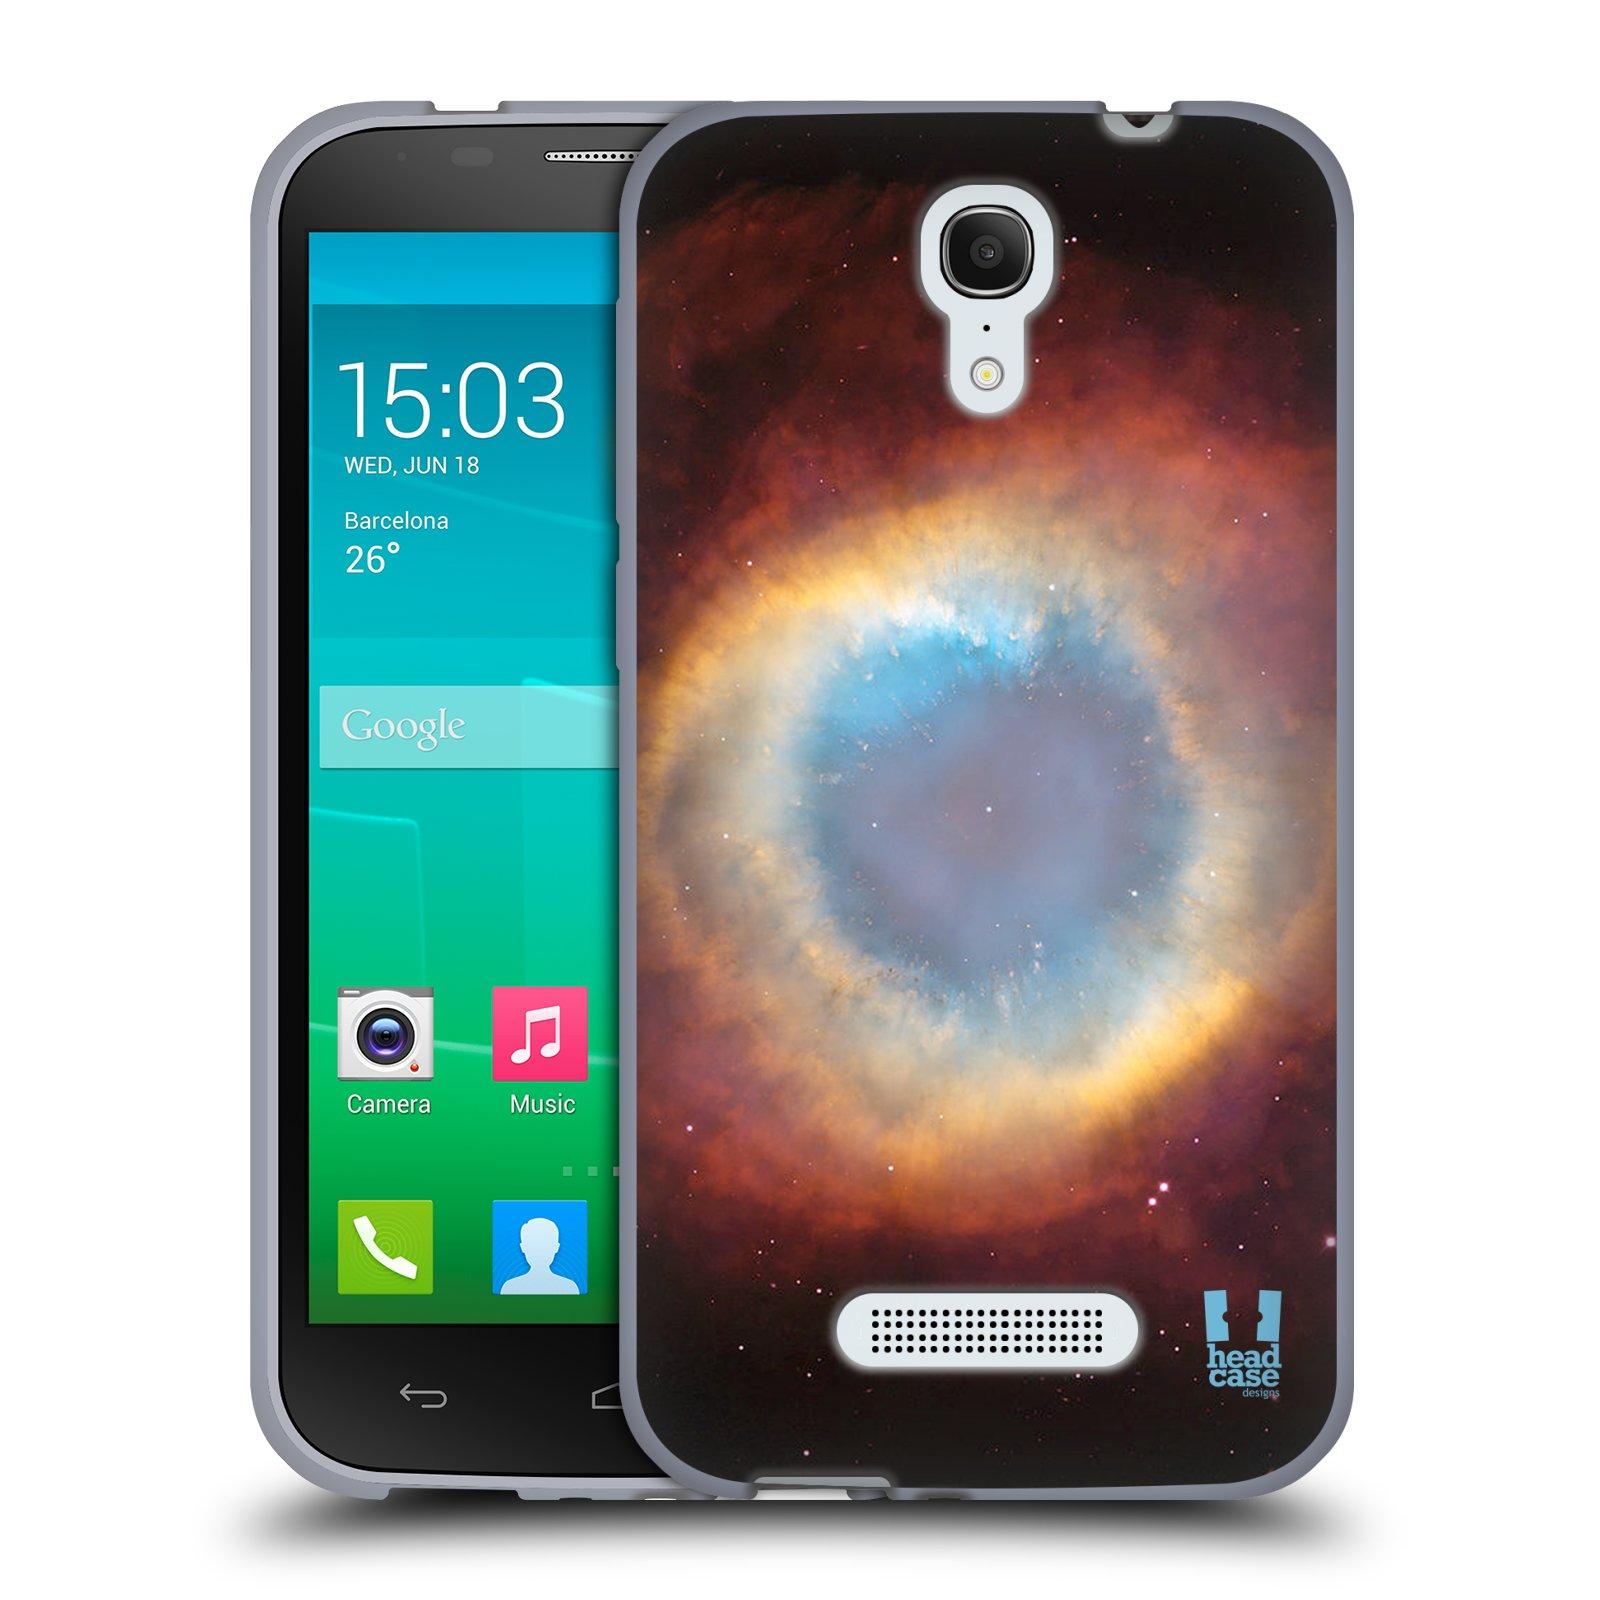 HEAD CASE silikonový obal na mobil Alcatel POP S7 vzor Vesmírná krása PLYNOVÁ MLHOVINA